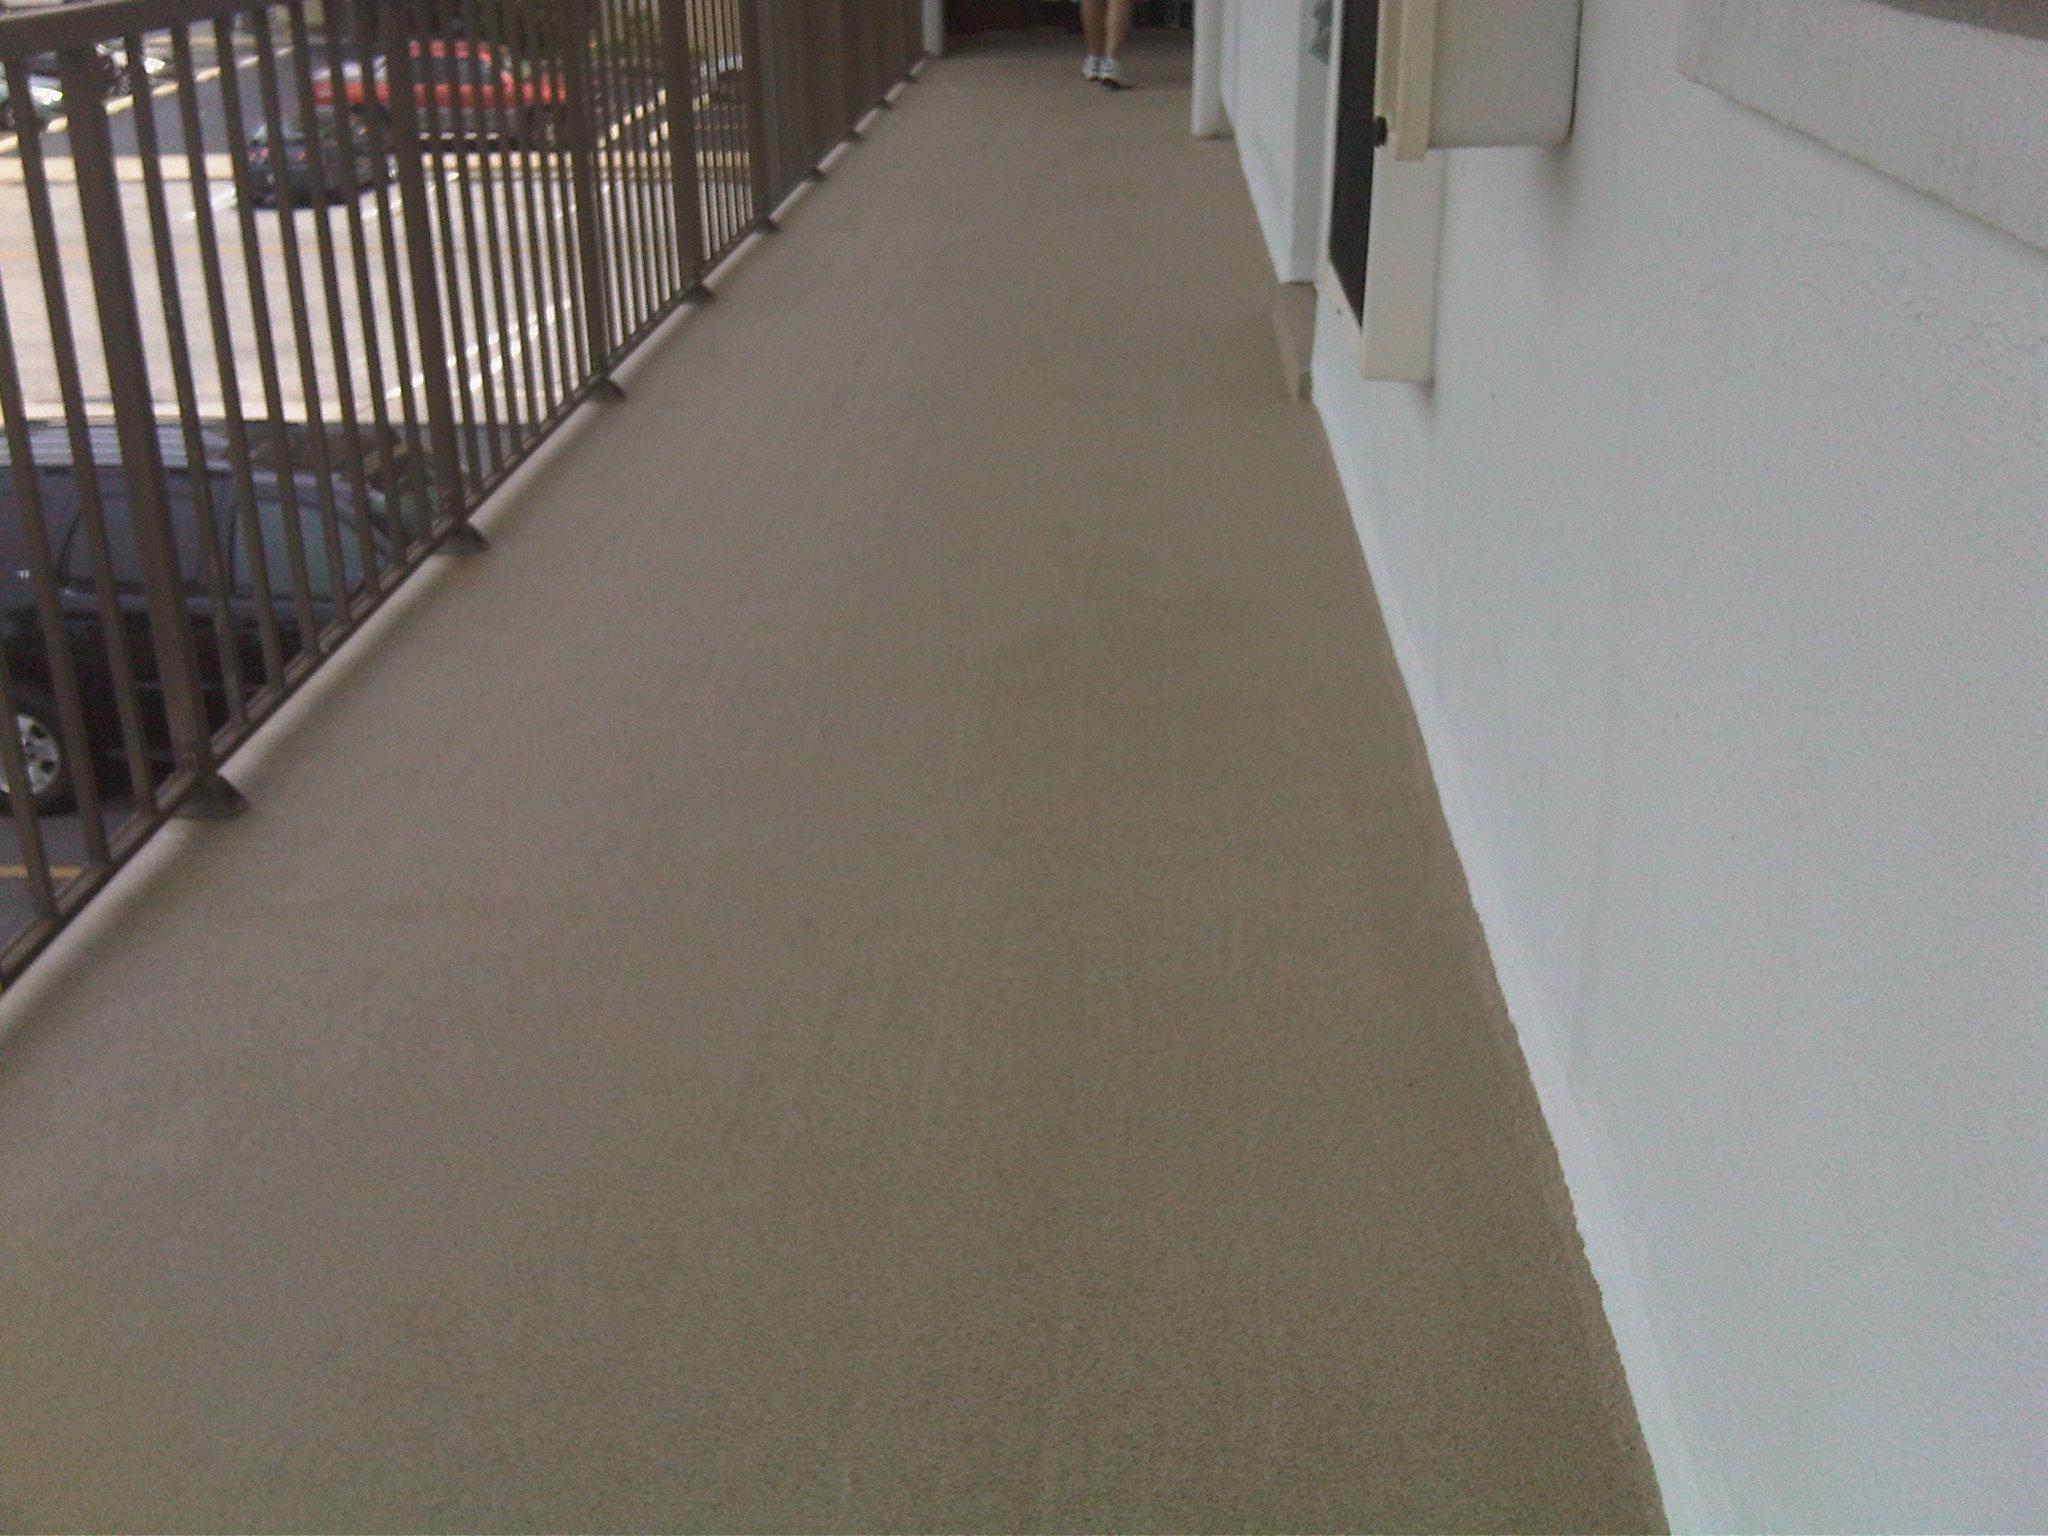 Dex O Tex Decor Floor Home Decorating Ideas